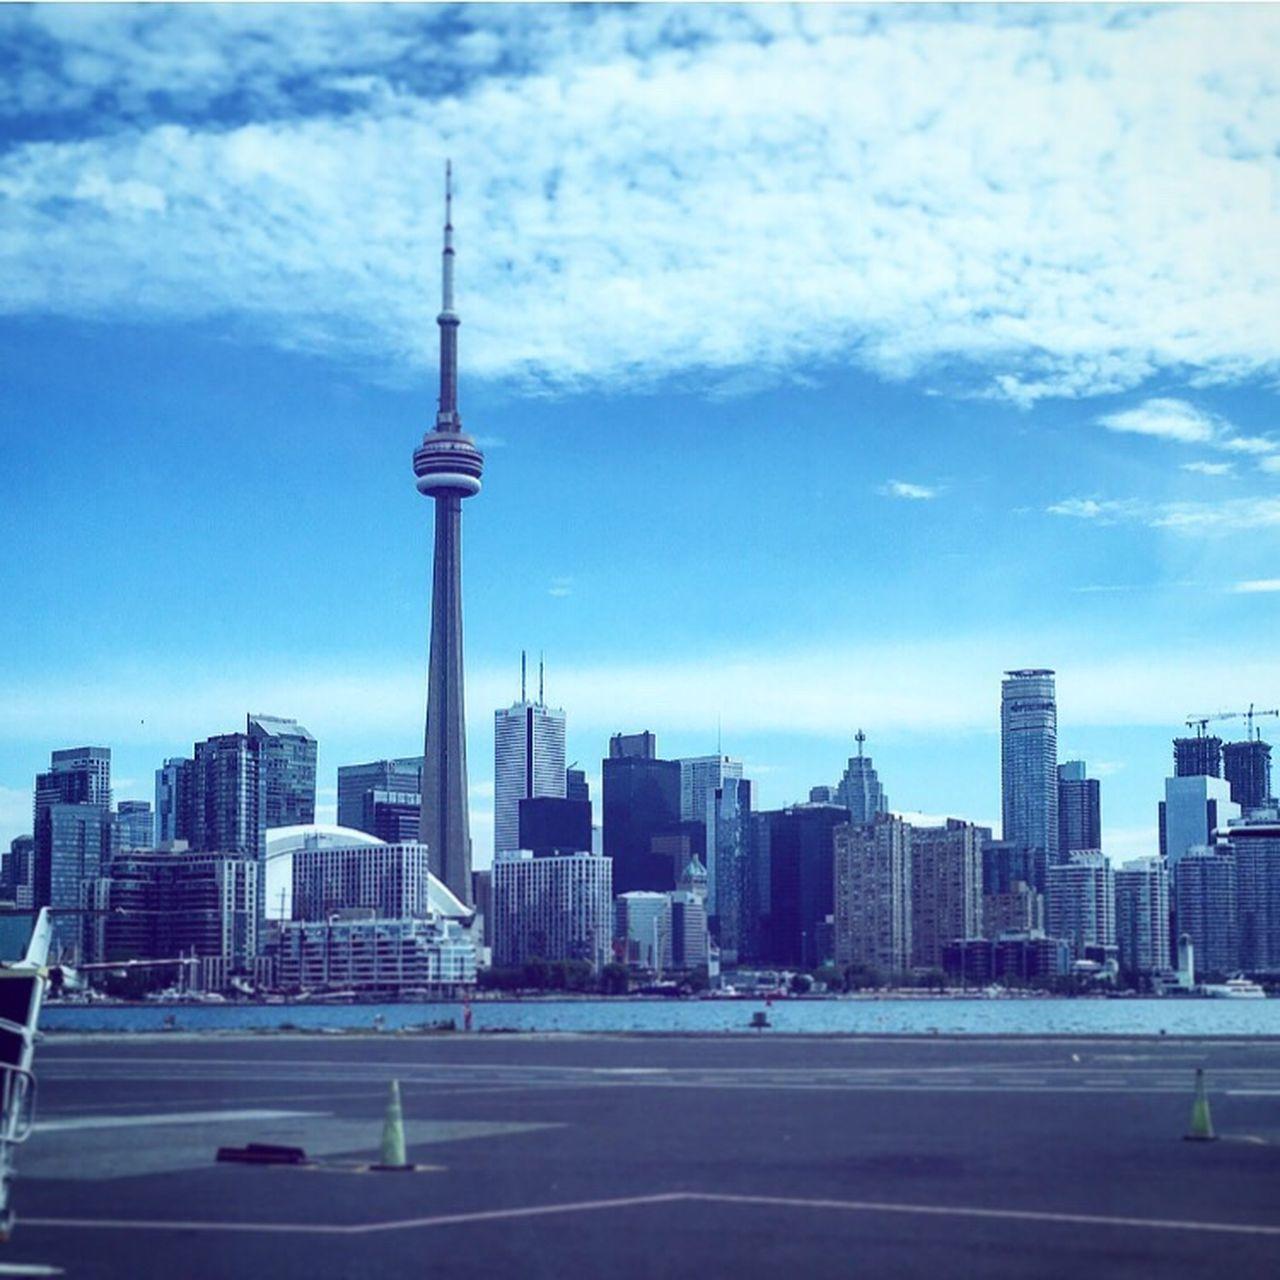 Built Structure Tower City Travel Destinations Sky